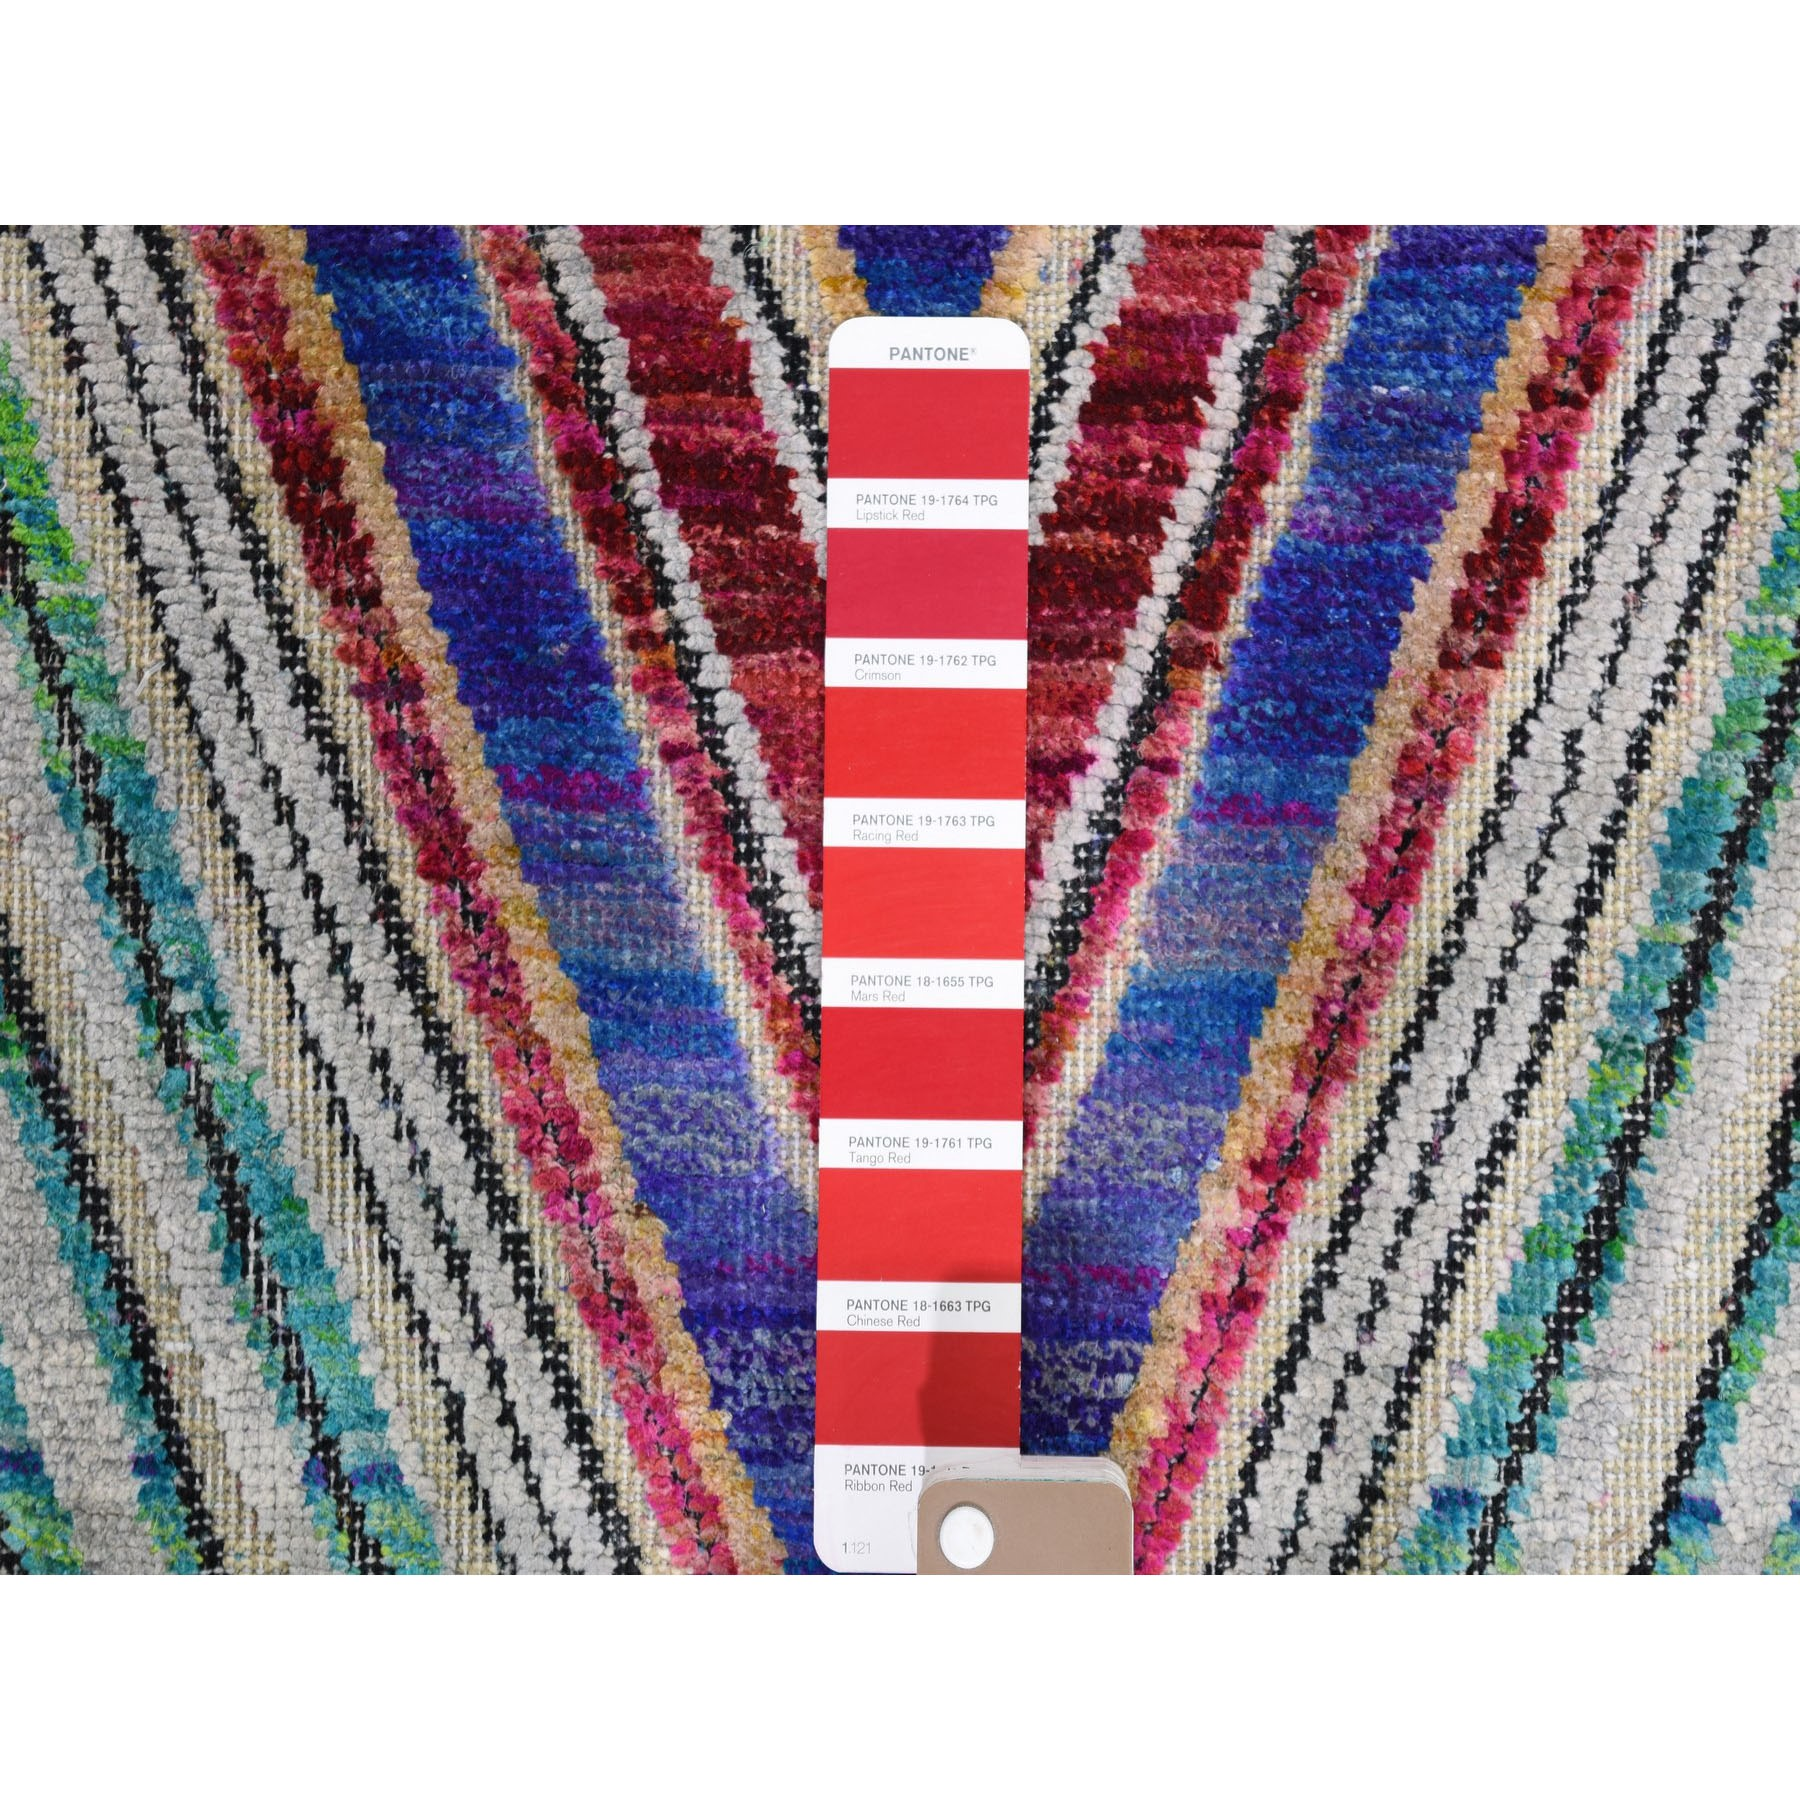 2-10 x5-2  Hand-Knotted Chevron Design Sari Silk with Textured Wool Oriental Rug